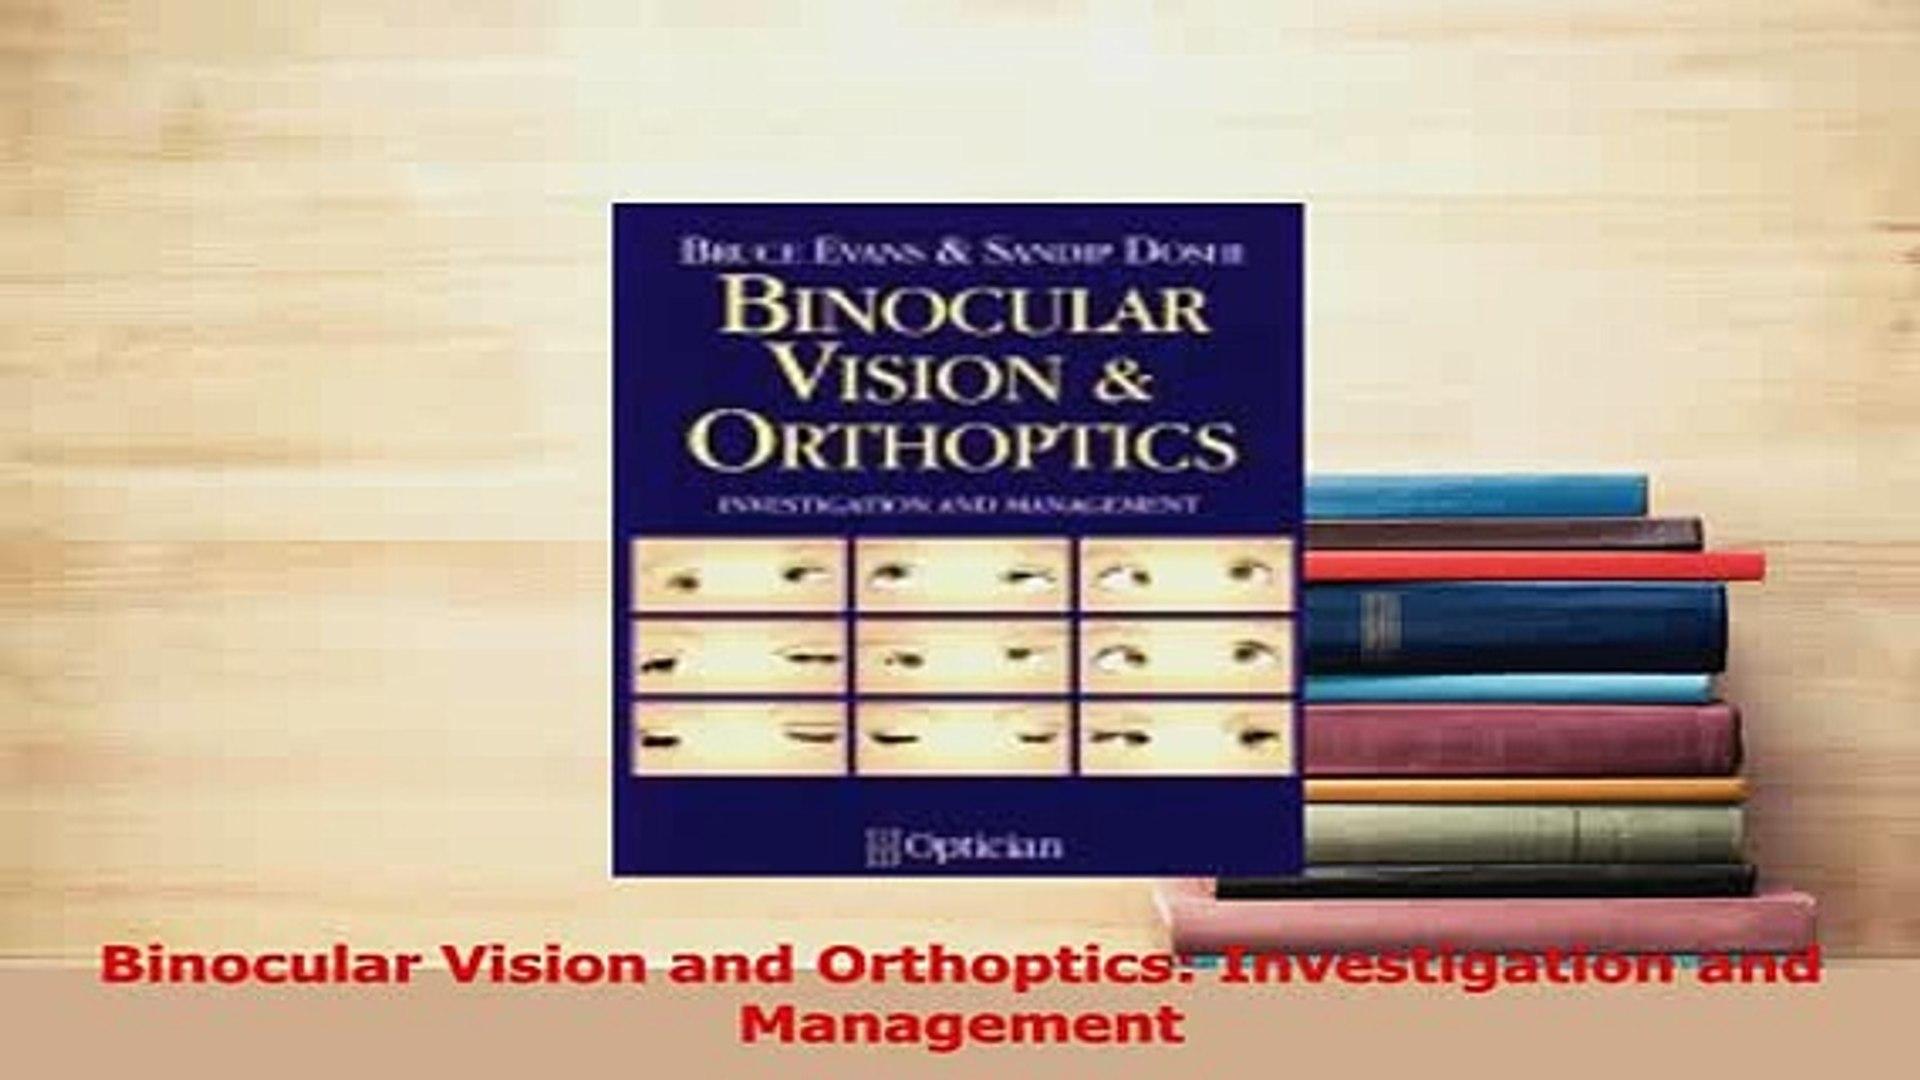 Binocular Vision & Orthoptics